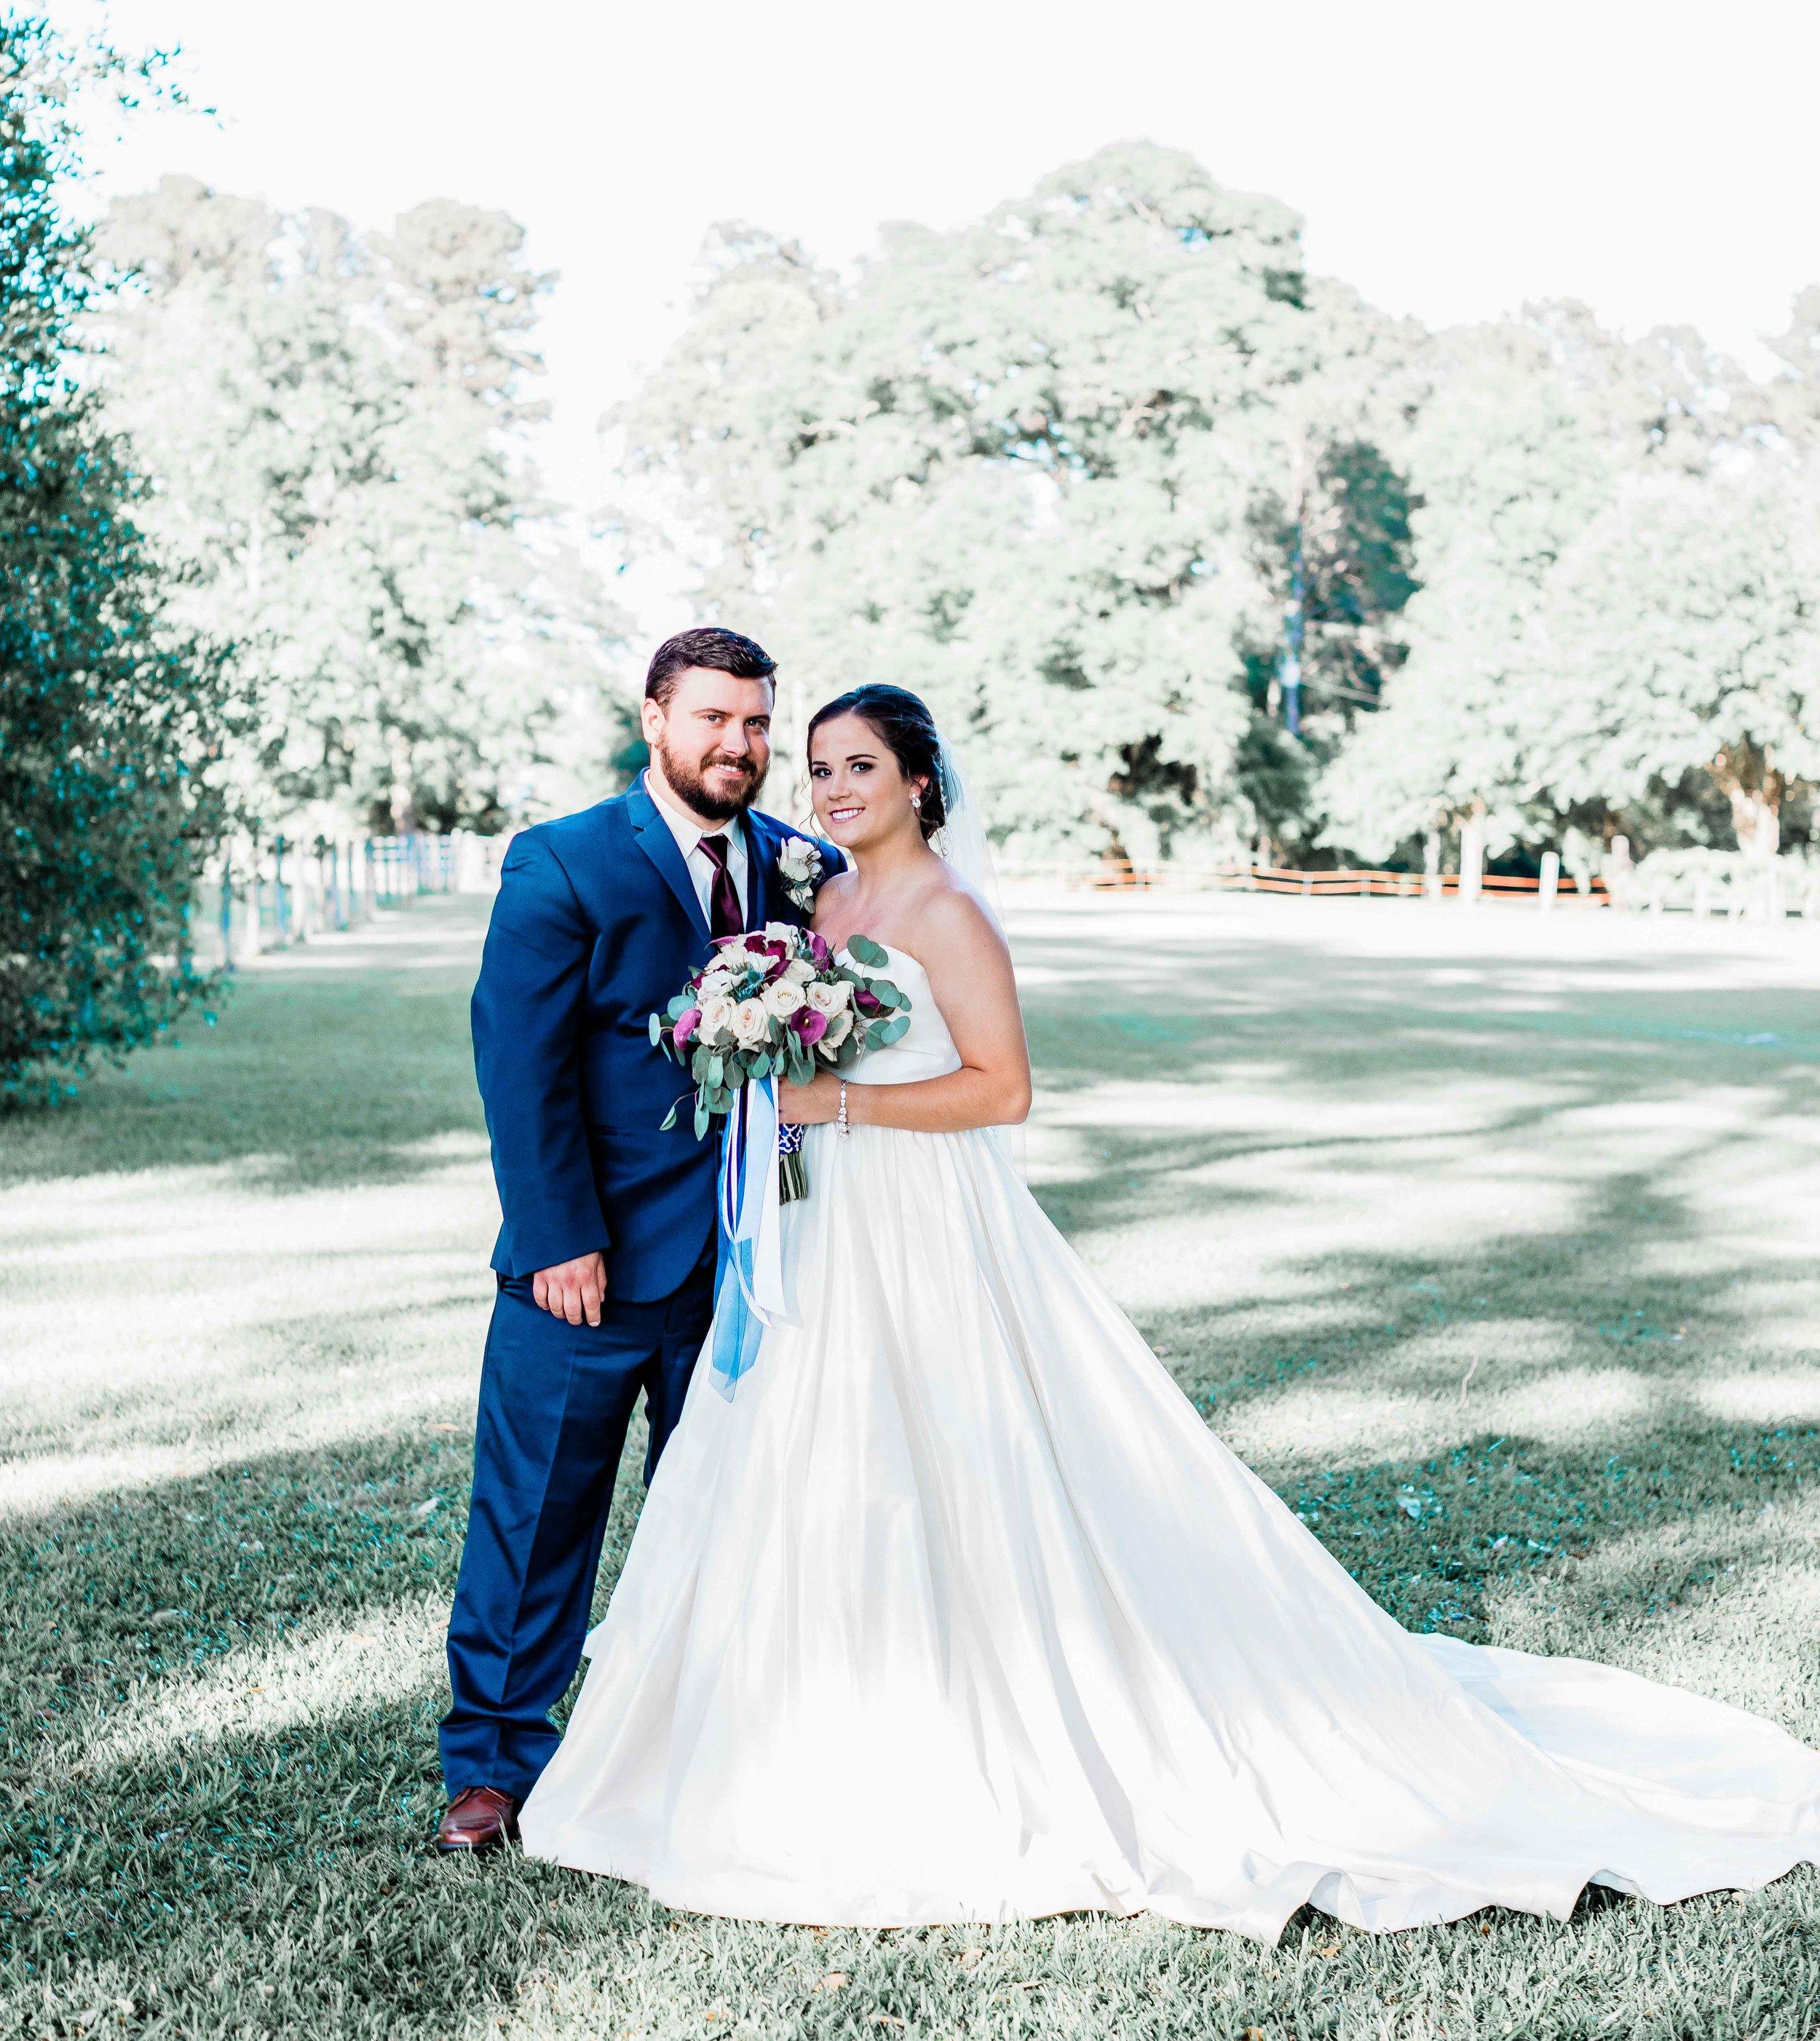 20190427-Southern Lens Photography- Savannah Wedding Photographer-Screven and Caroline-201980.jpg